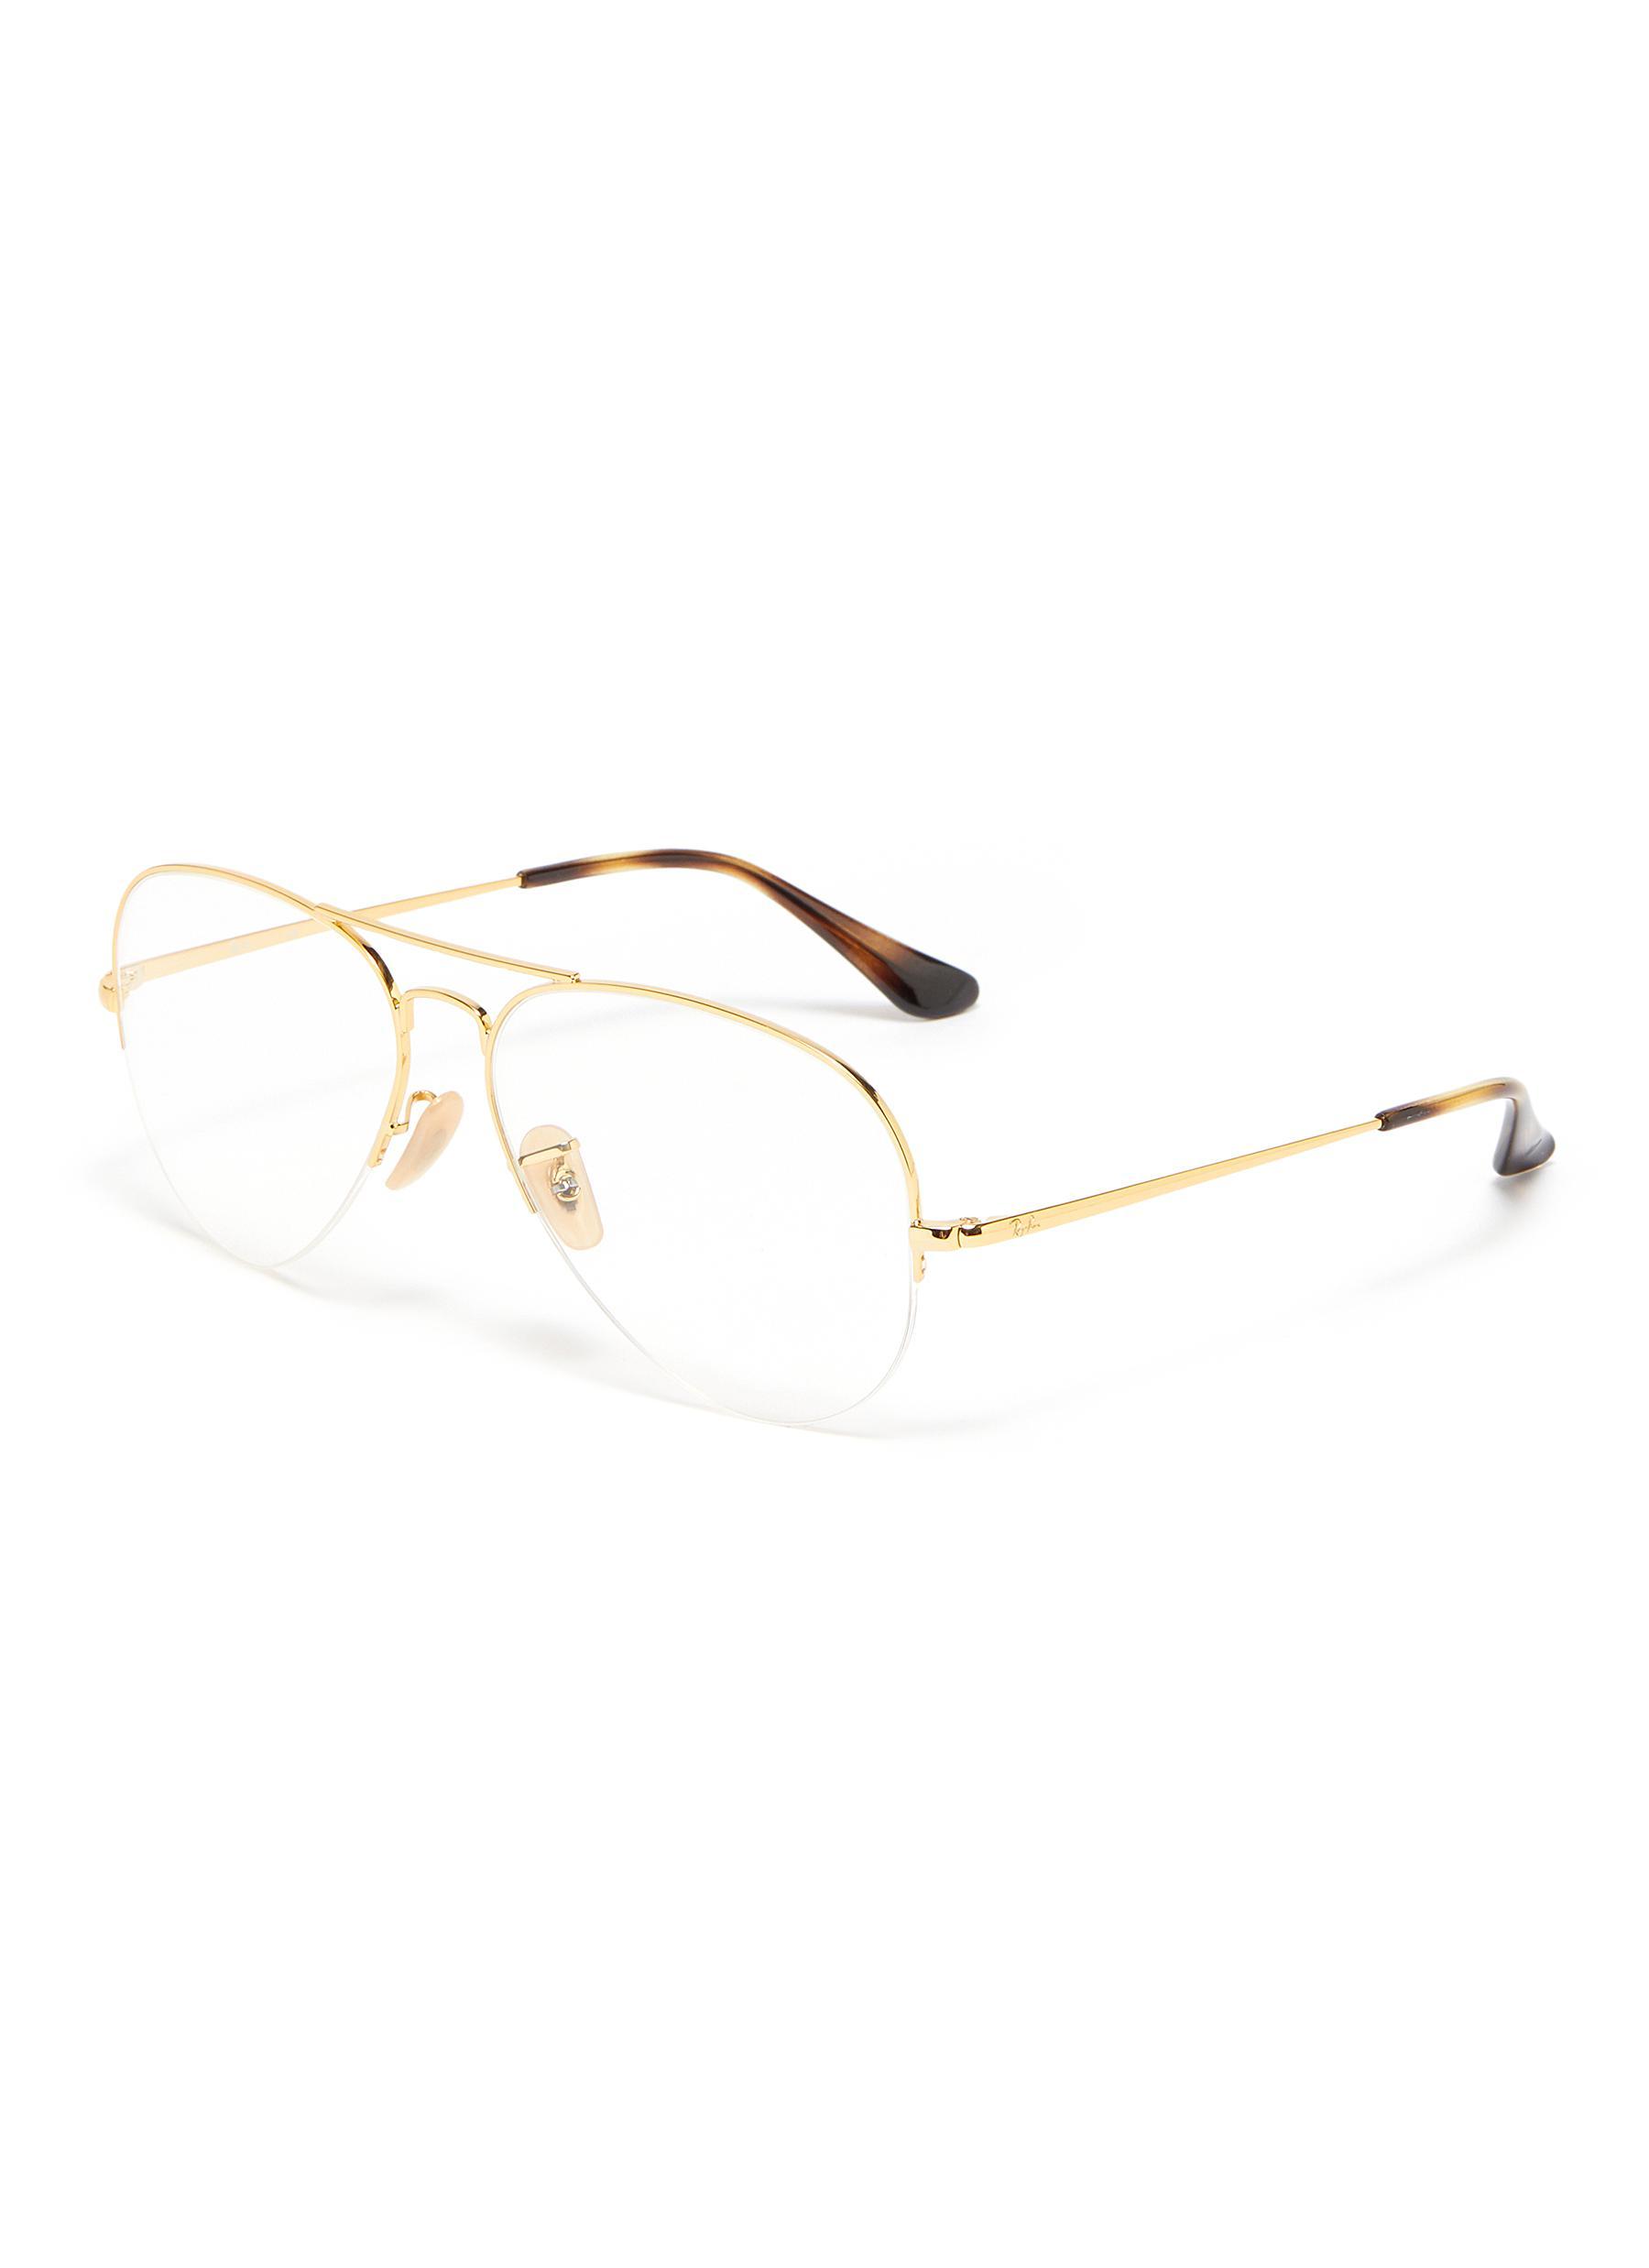 b486b5f0d4fd2 Ray-Ban.  Aviator Gaze  metal optical glasses